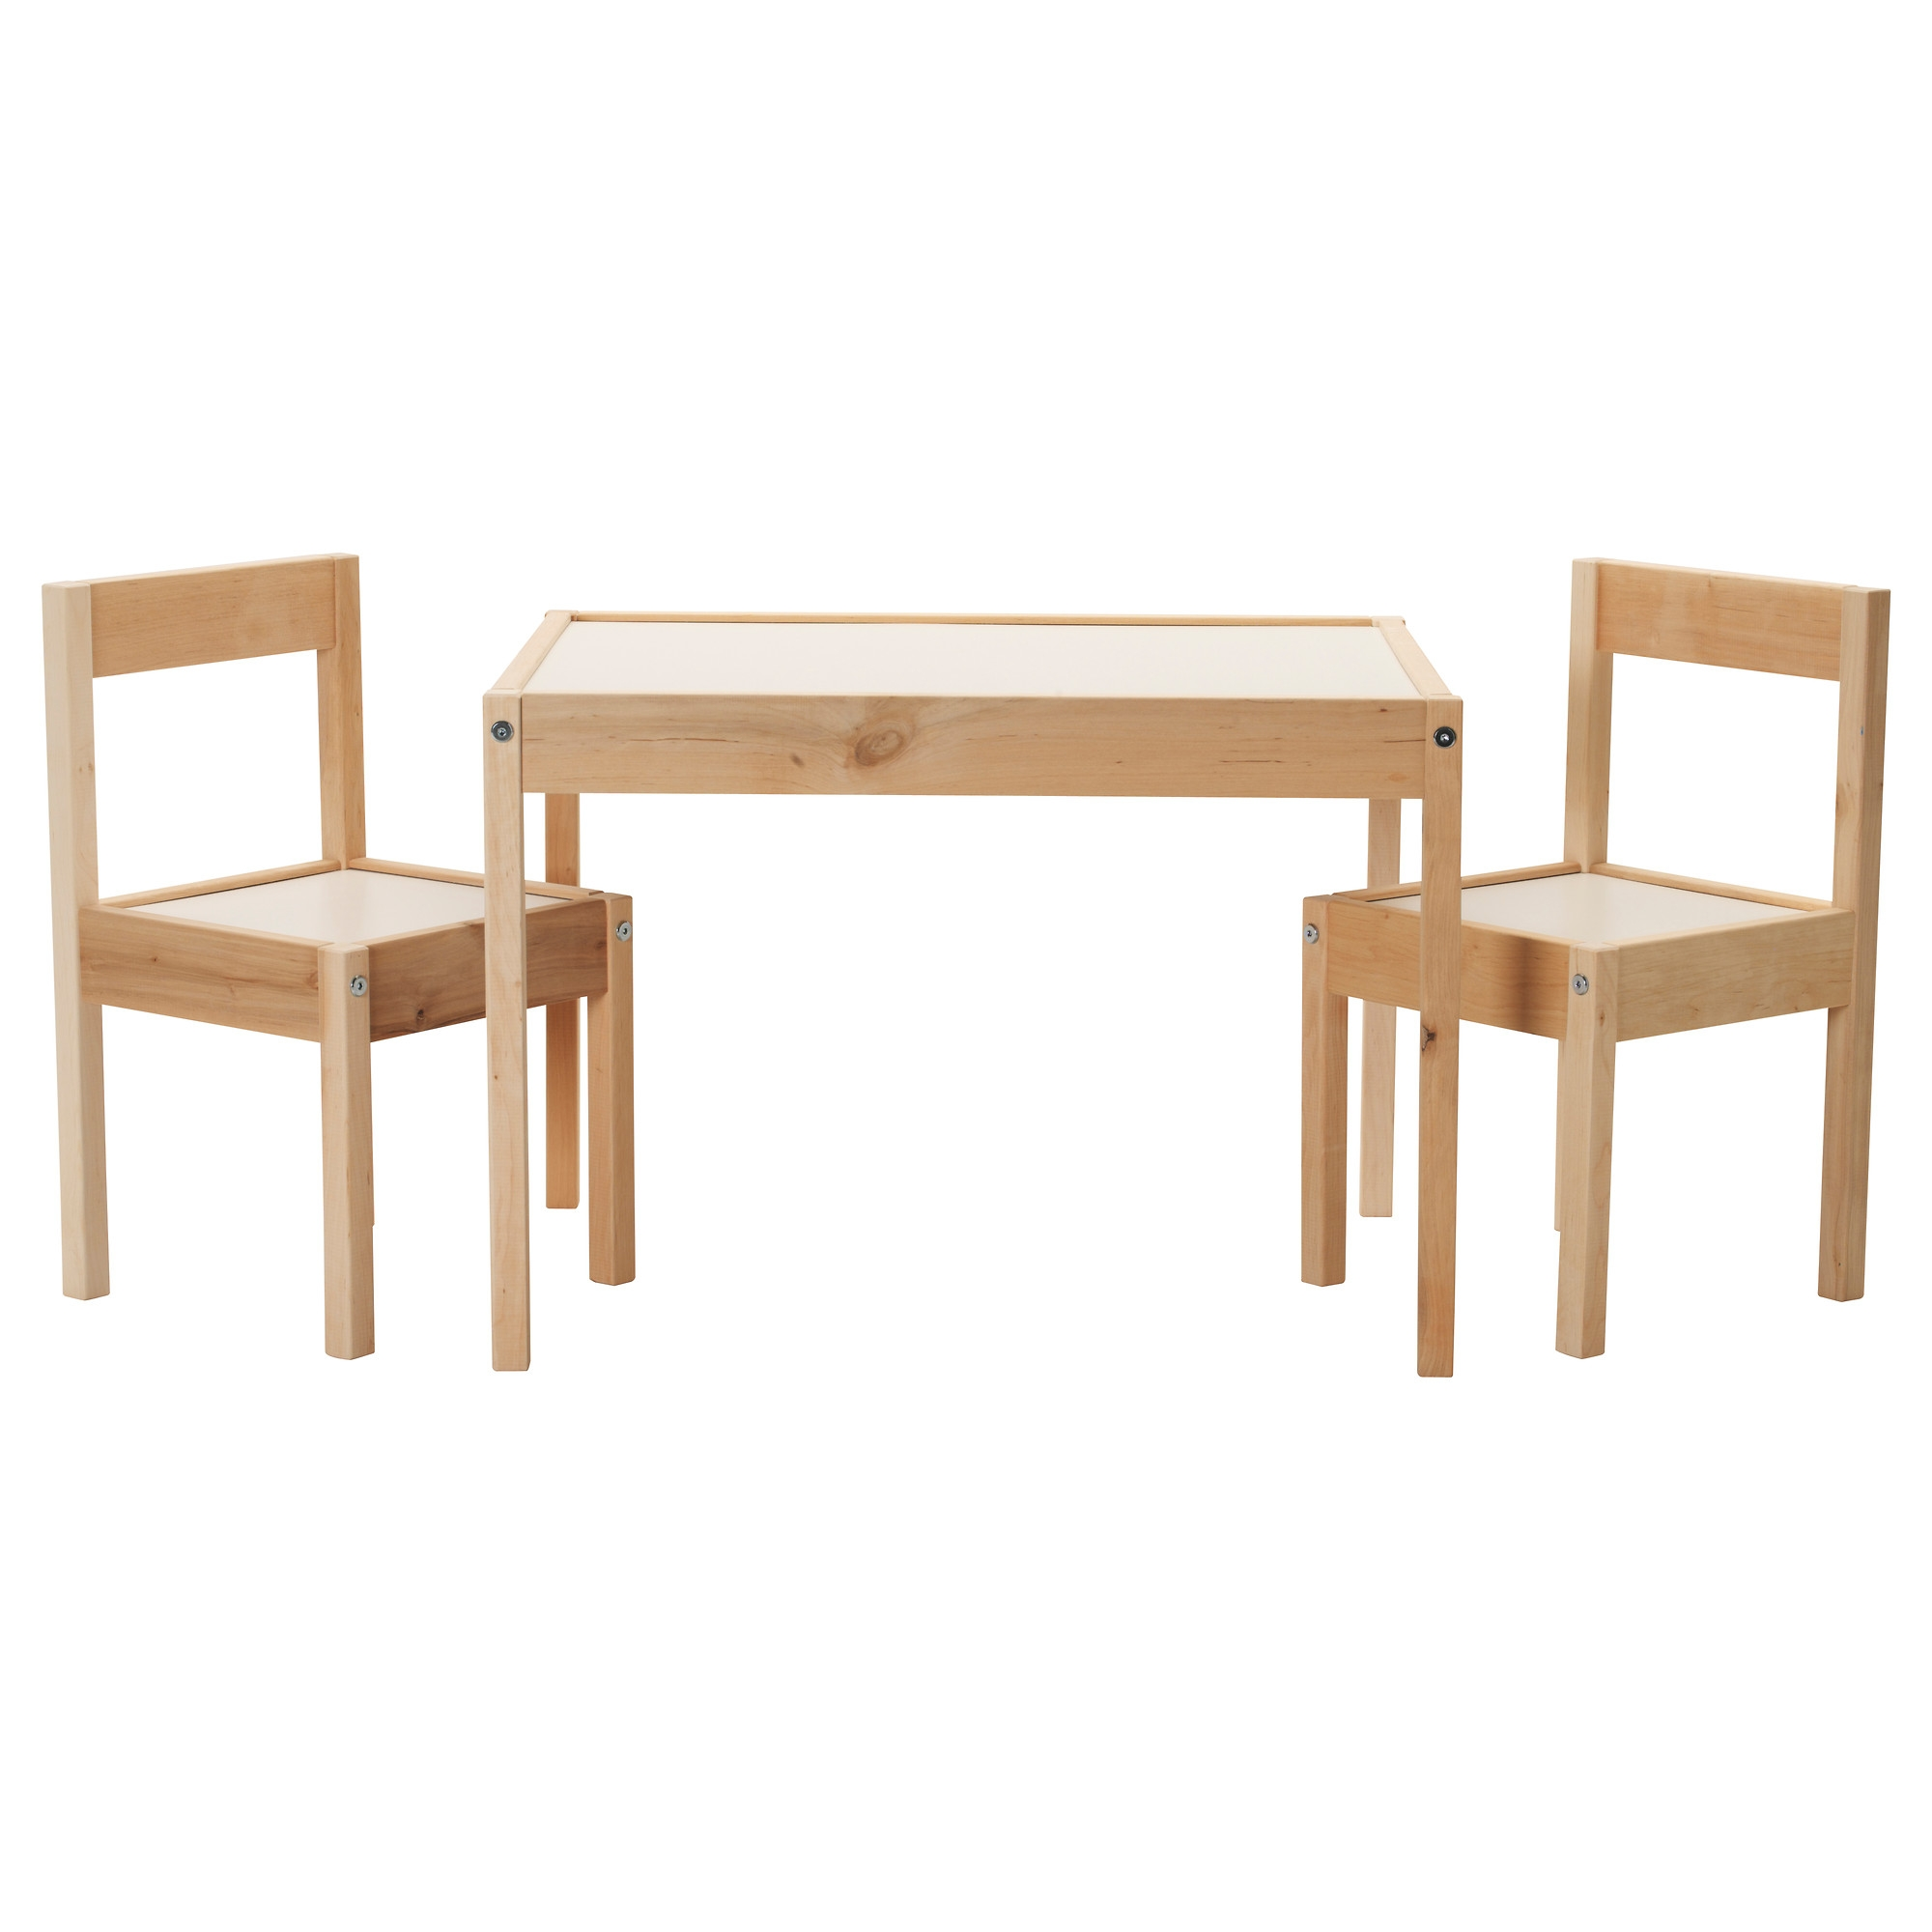 L tt mesa para ni os con 2 sillas for Medidas sillas ninos